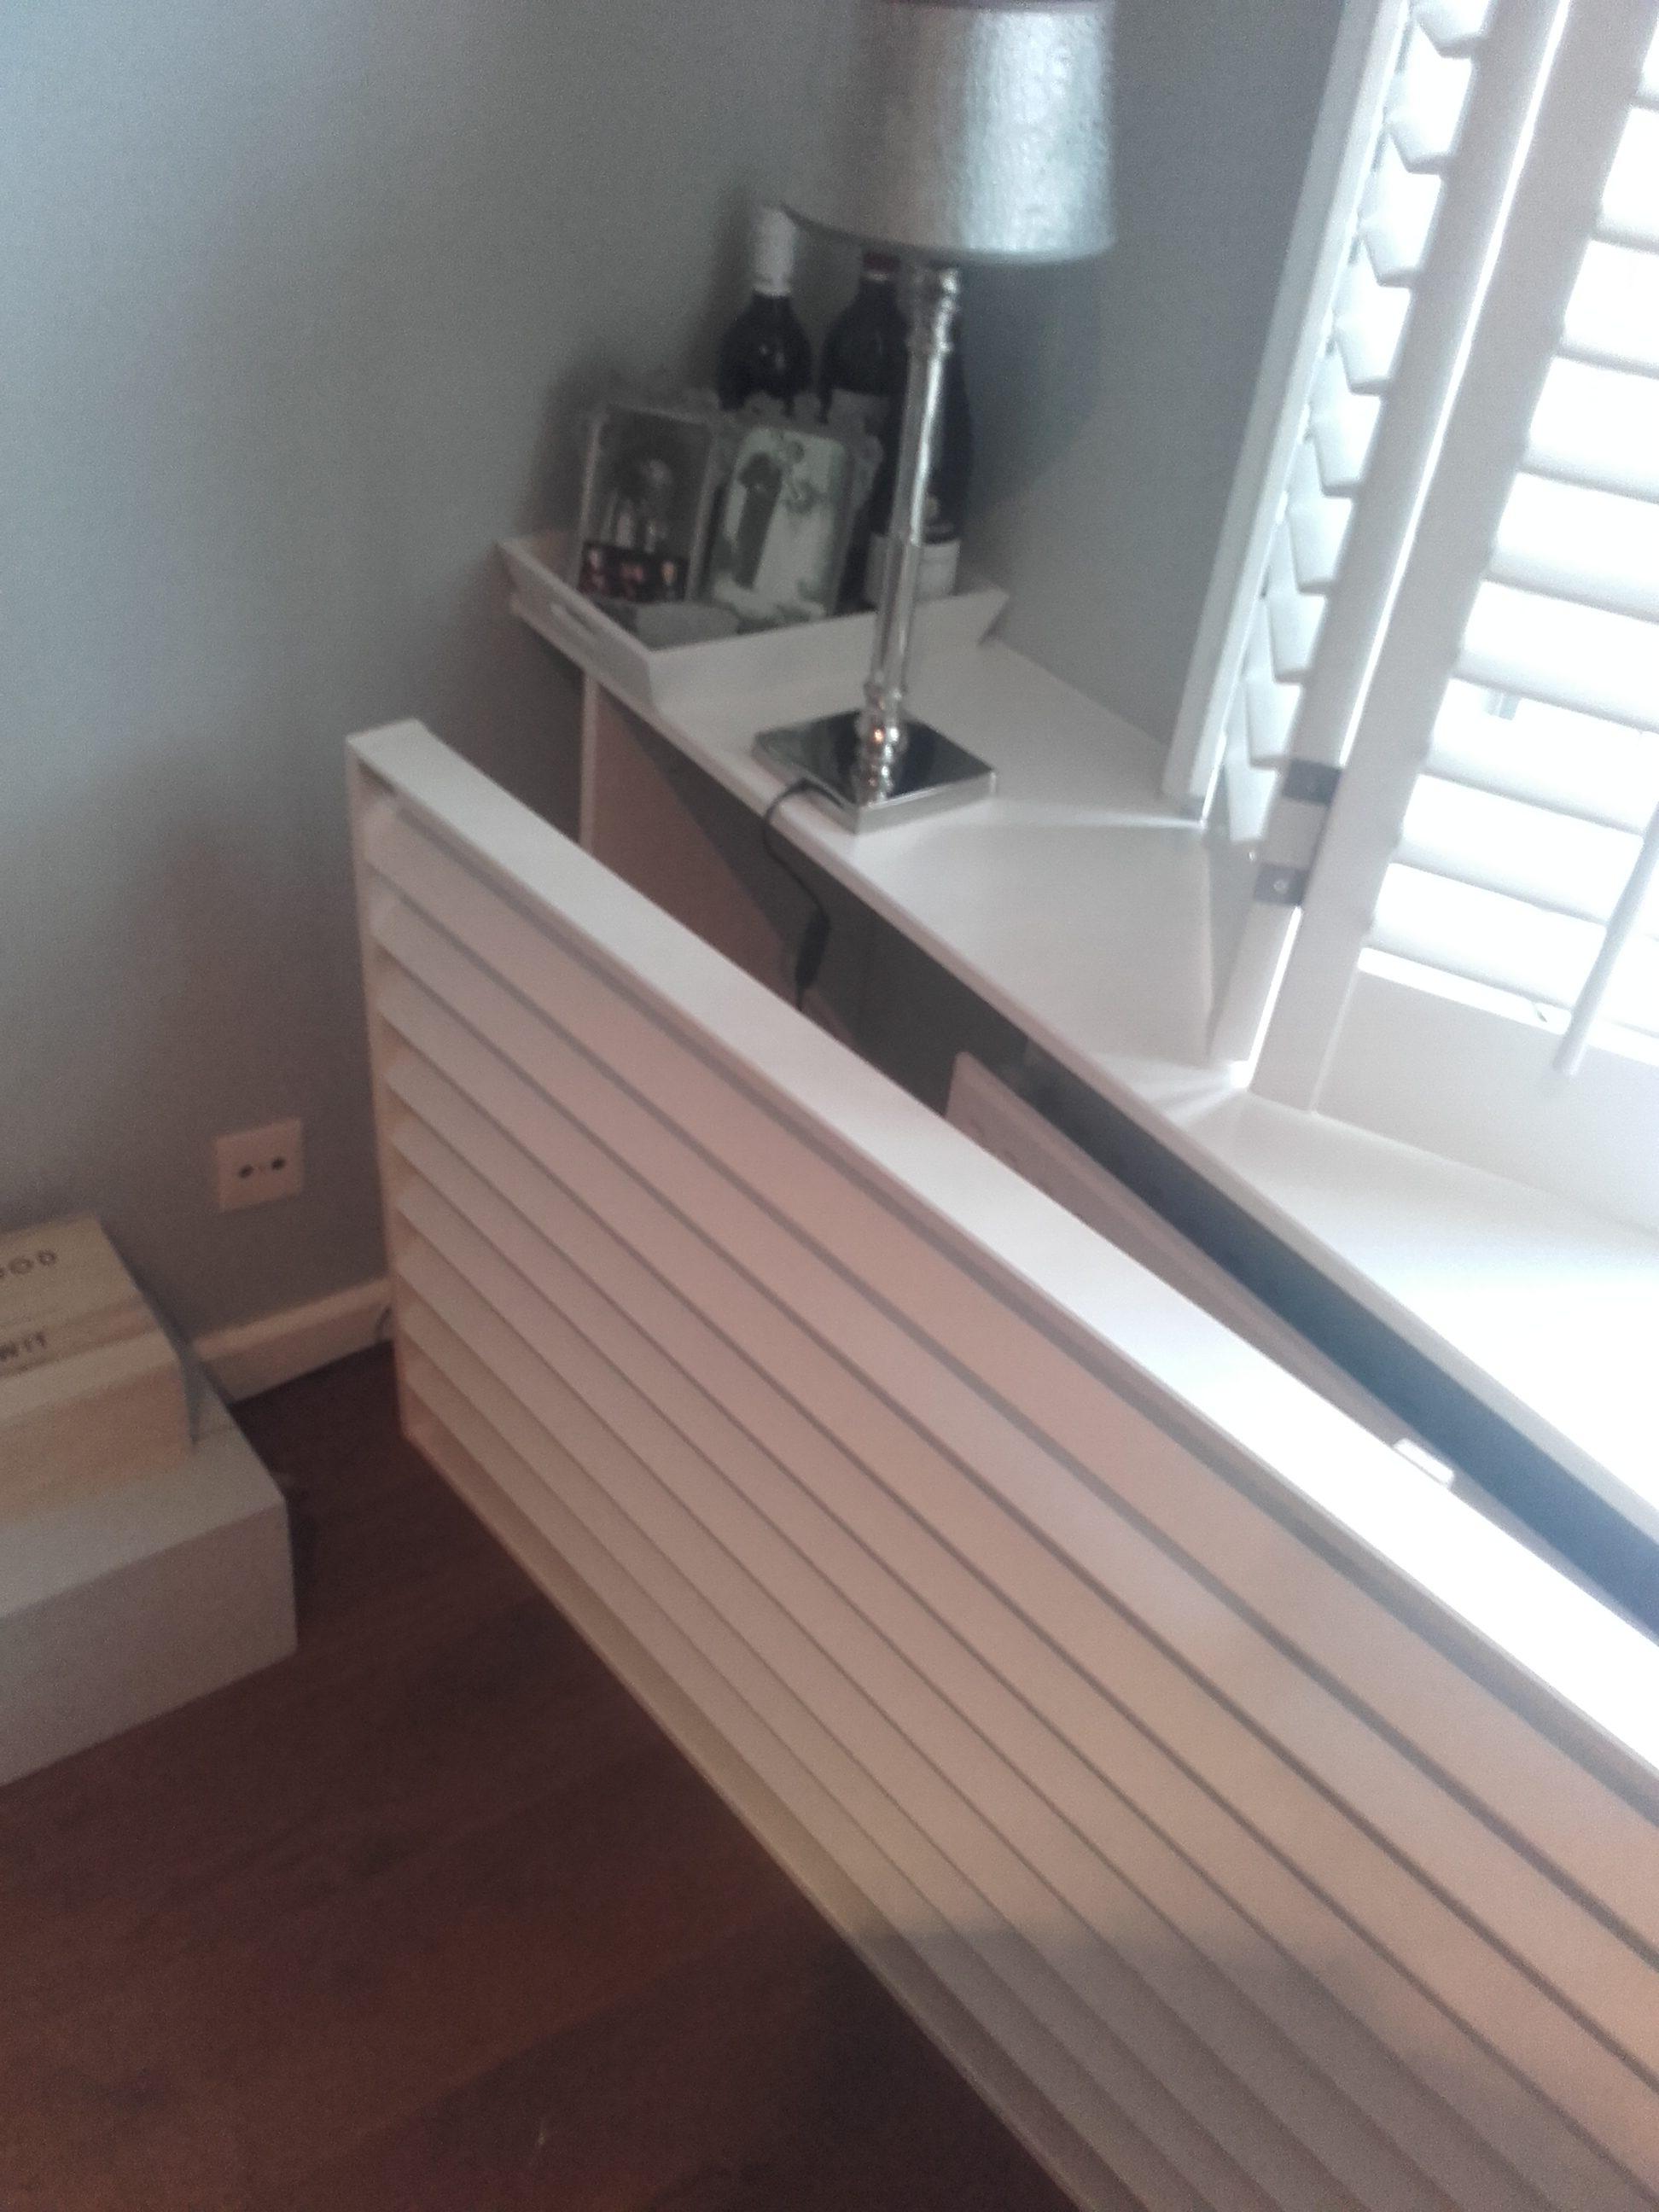 radiatorombouw-met-lamellen-klusjesman-rotterdam